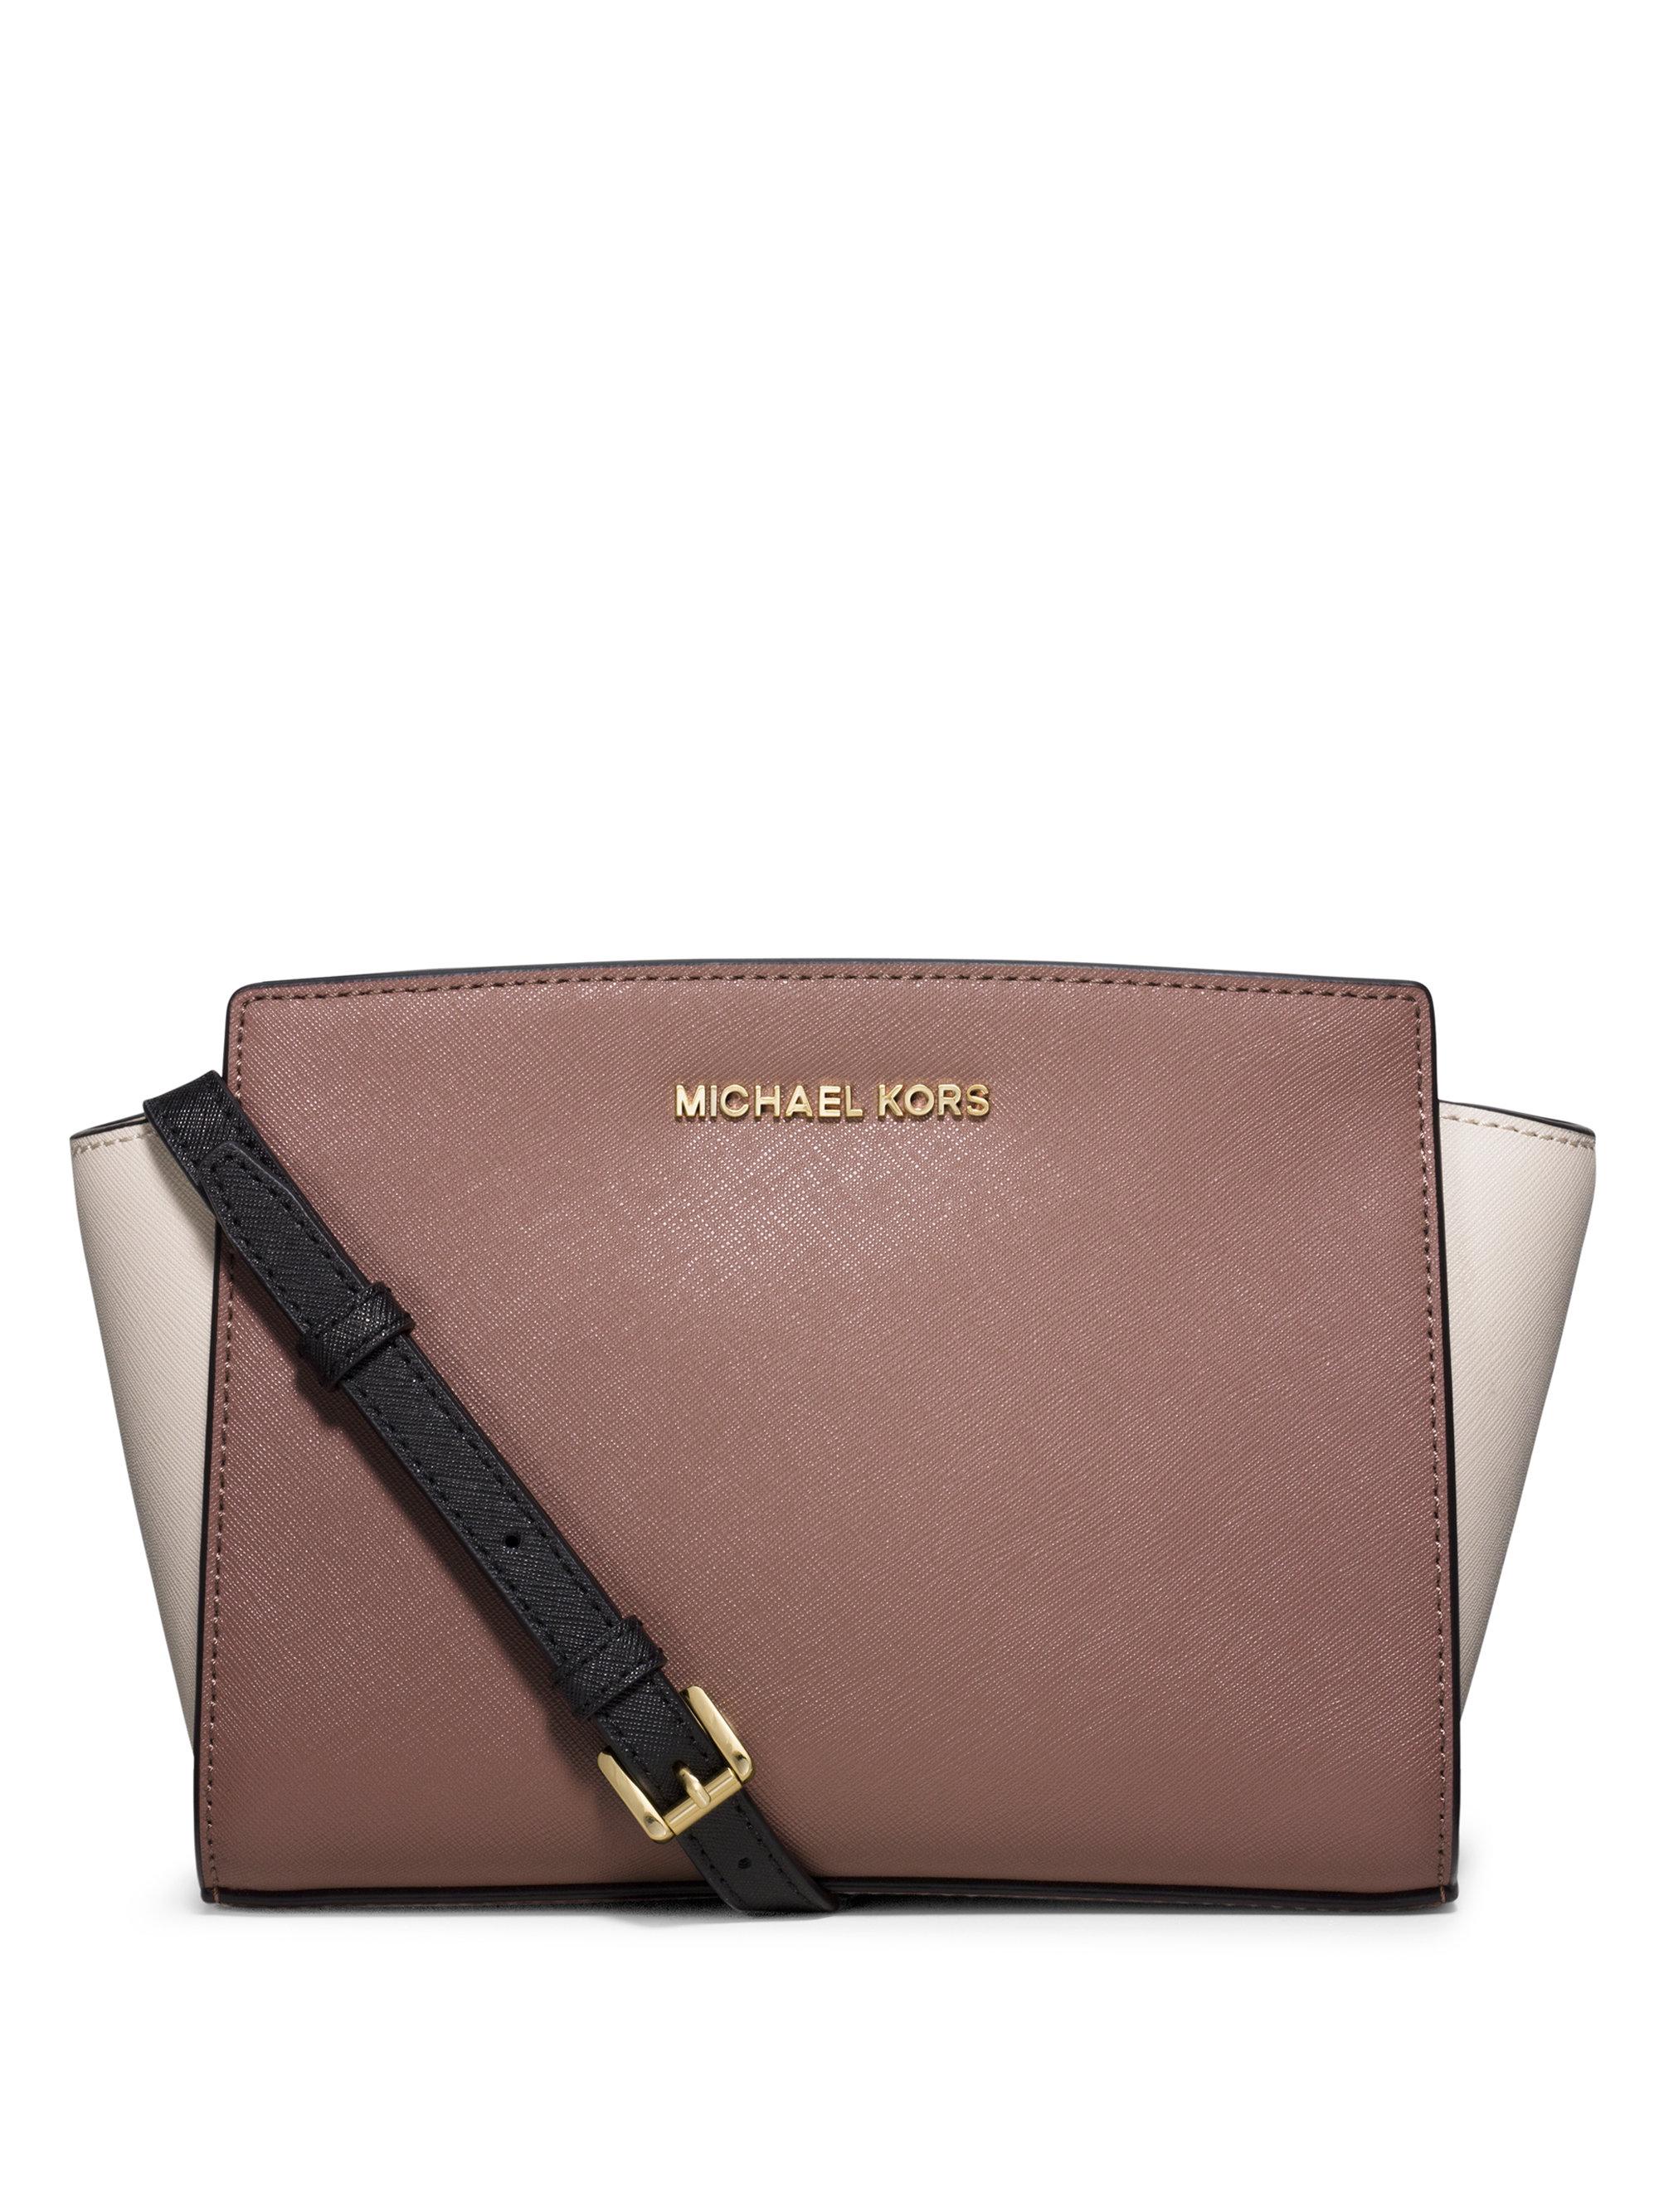 ... wholesale lyst michael michael kors selma medium messenger bag in brown  34e33 f1128 775092a14a7d8